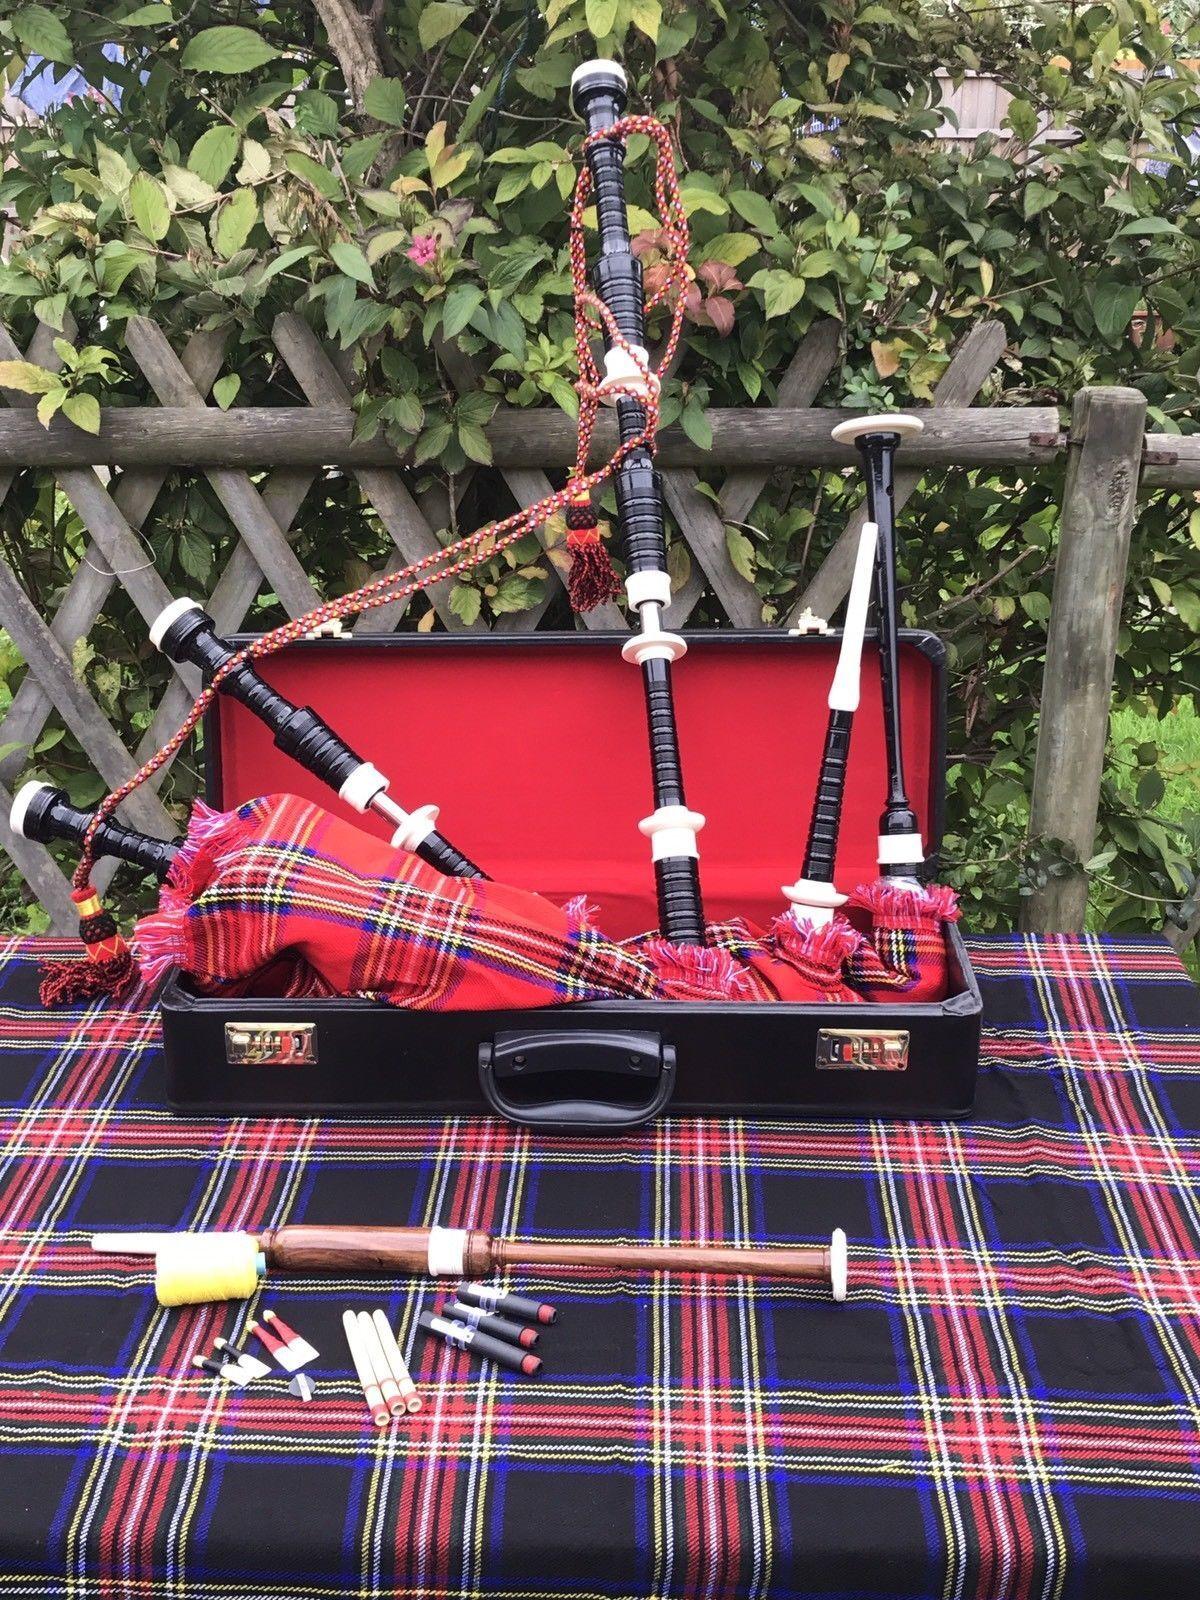 Great Highland Bagpipes Voll Imitat Halterungen Scottish Dudelsack Lehrmeister